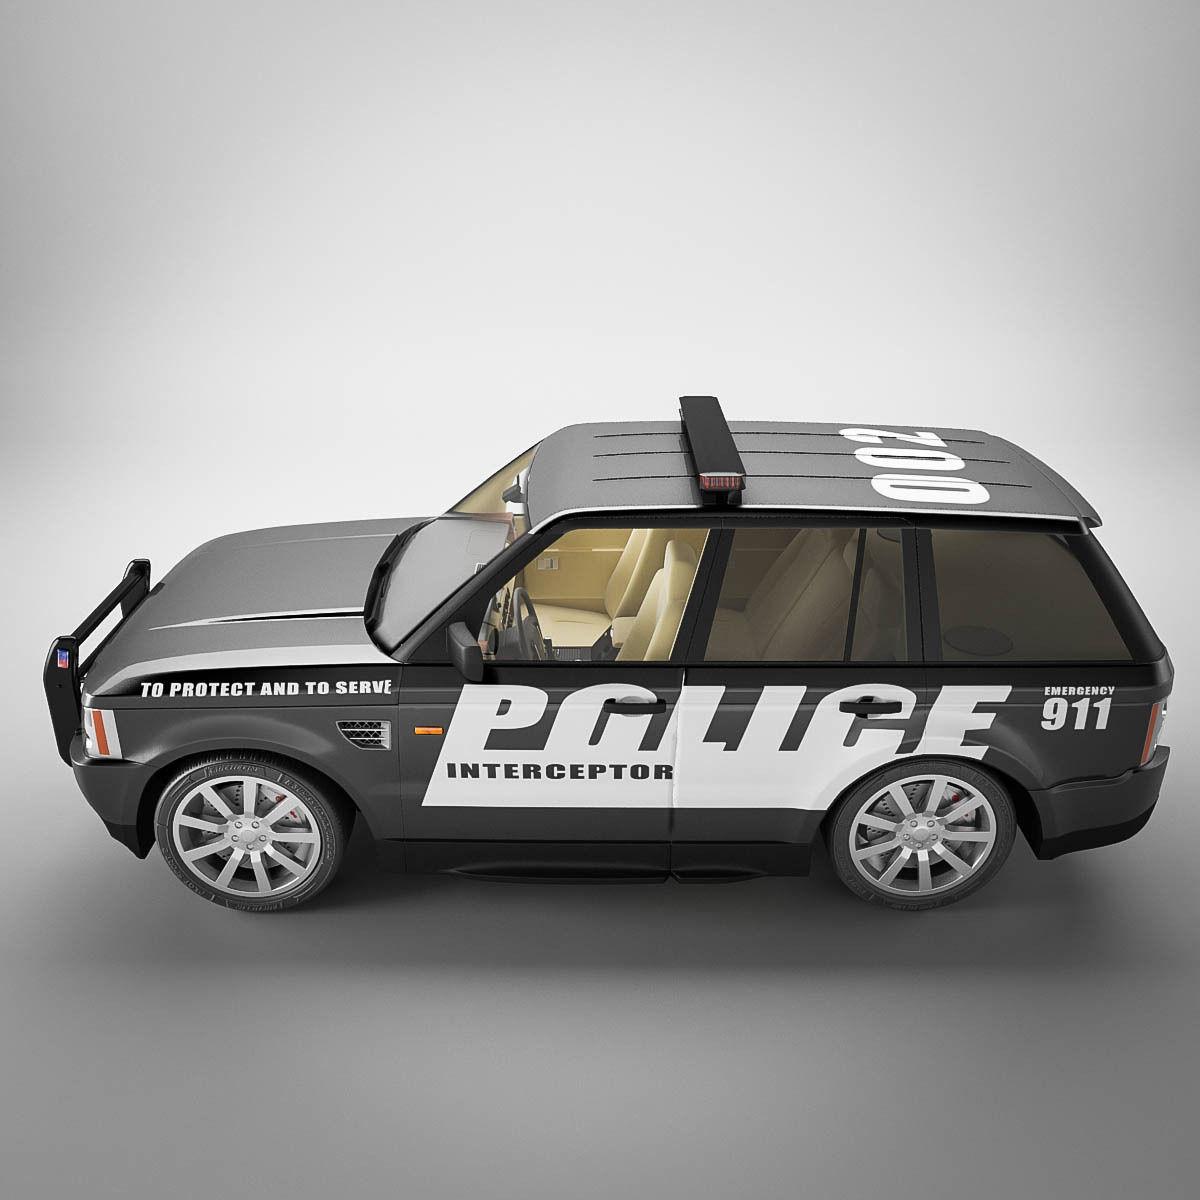 Land Rover Range Rover L405 2014 3d Model From Humster3d: Range Rover Sport Police 3D Model .max .obj .3ds .fbx